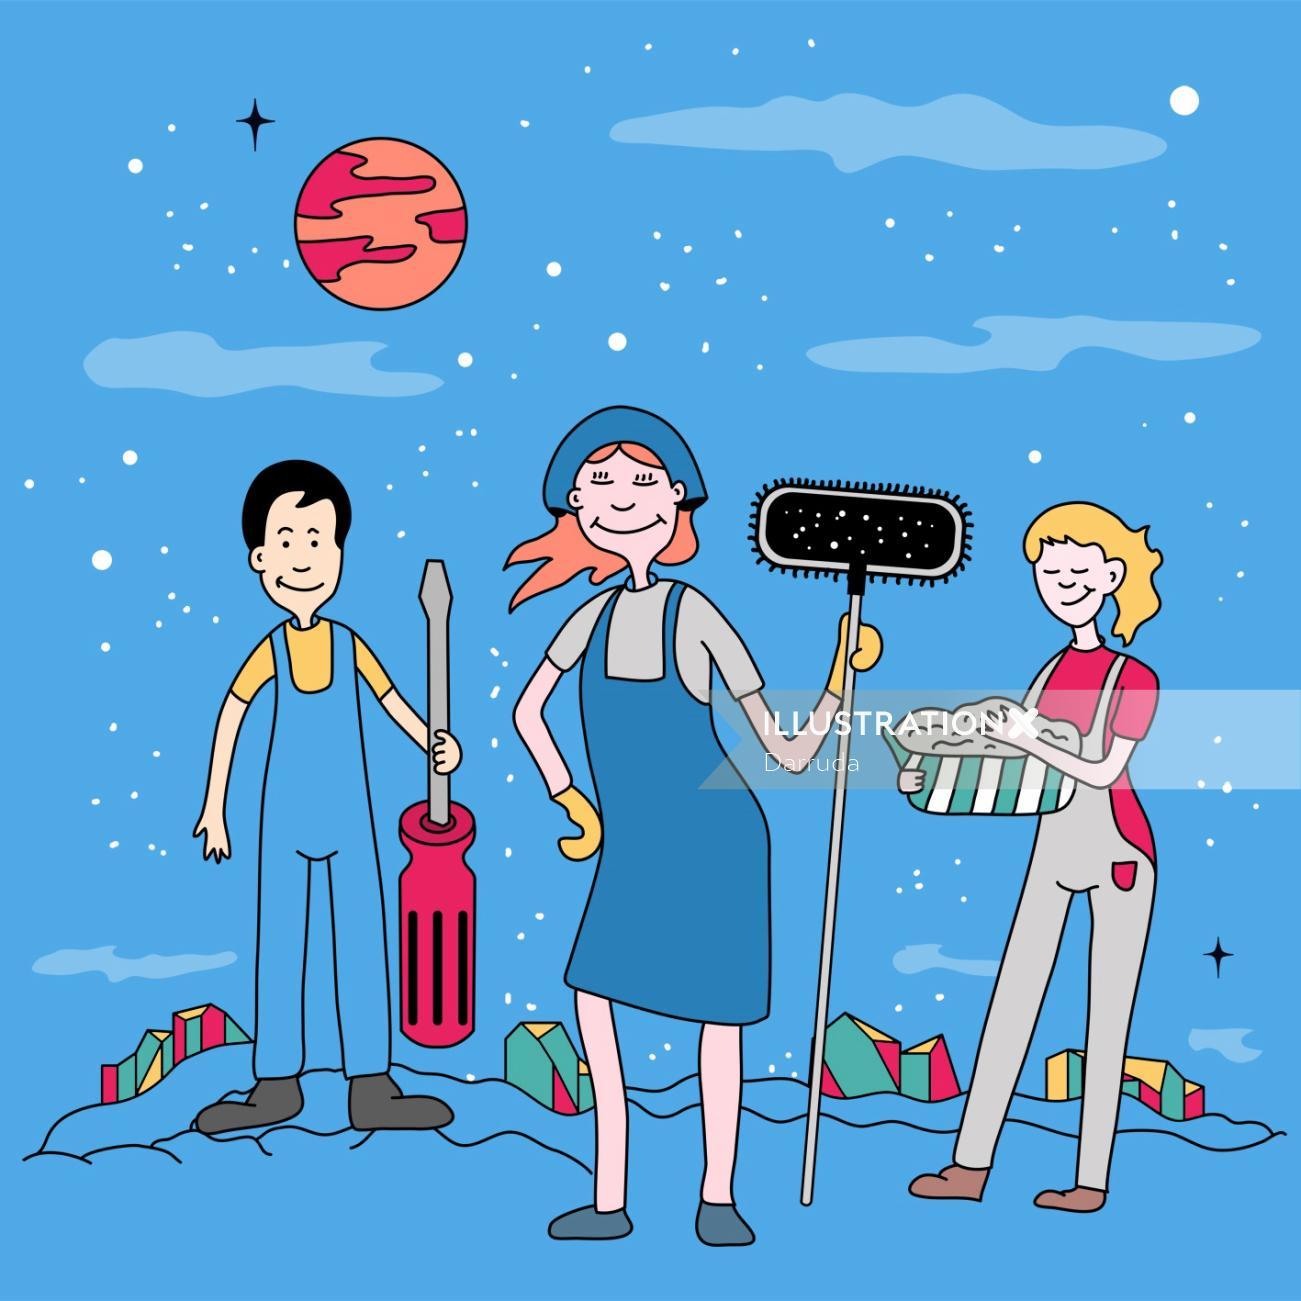 Digital illustration of people offering services